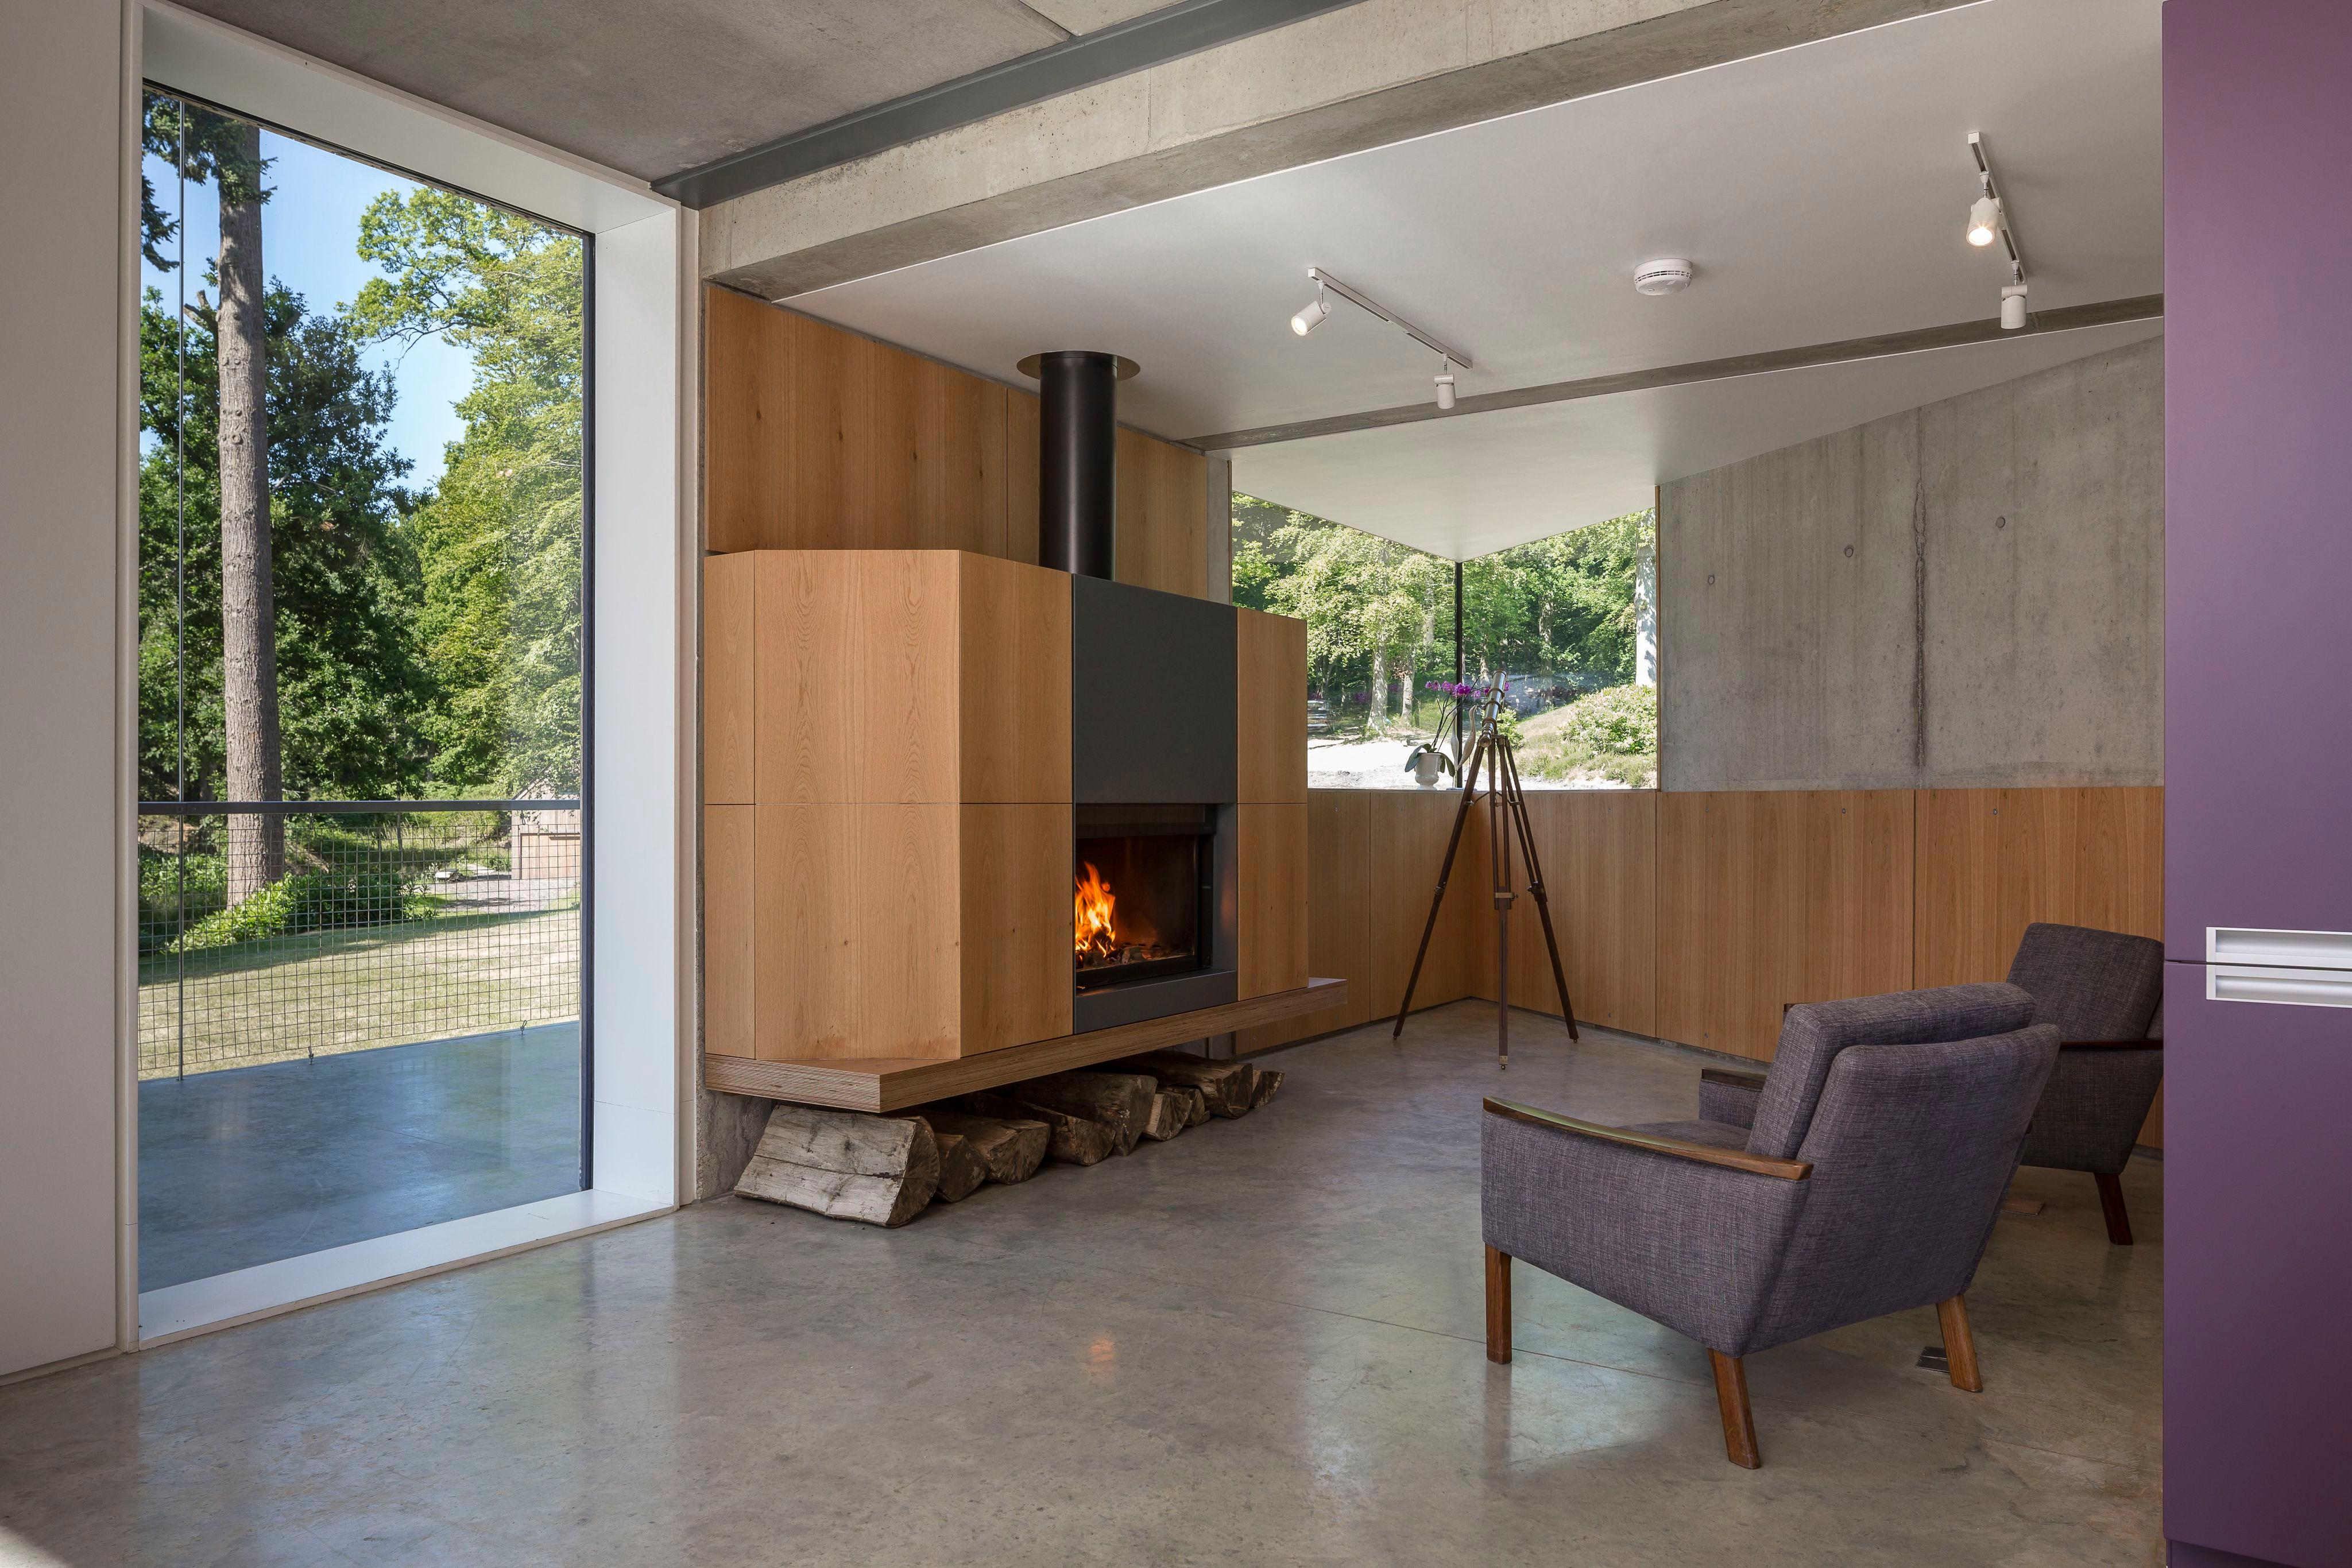 moderne kaminecke kamin sessel groesfenster manser medaltim crocker architekt - Bcherregal Ideen Neben Kamin